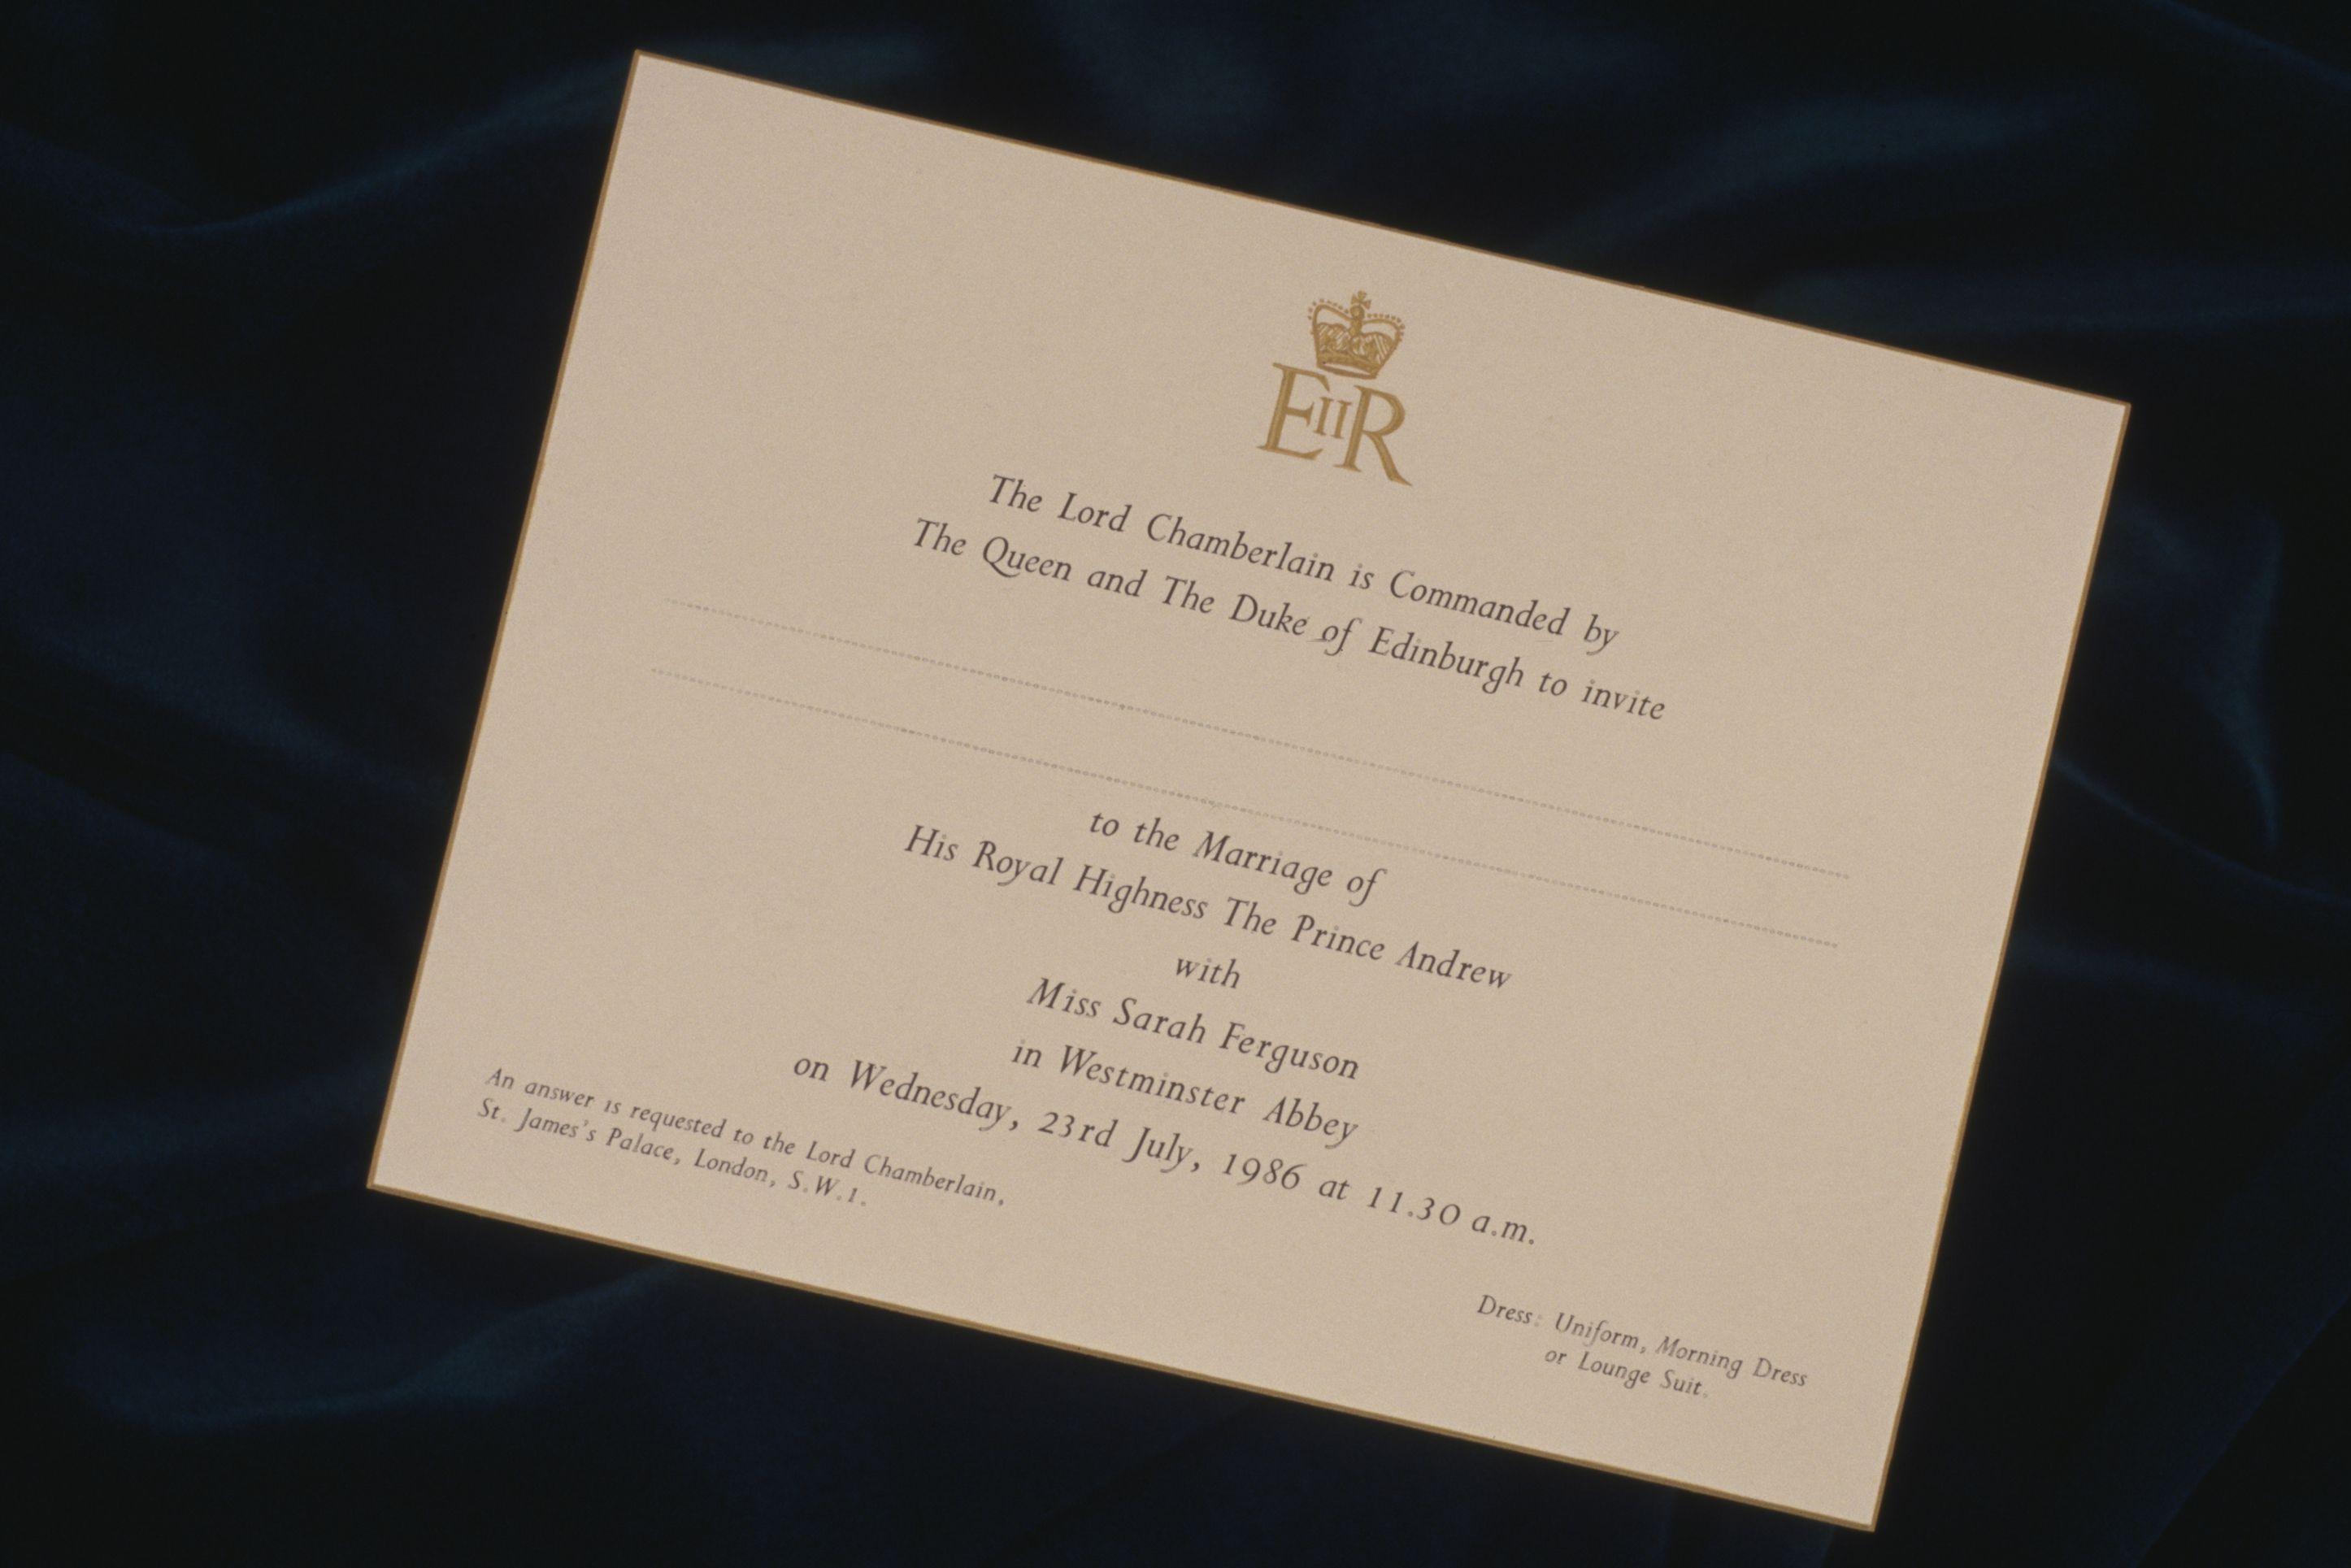 Sarah Ferguson and Prince Andrew Wedding invitation